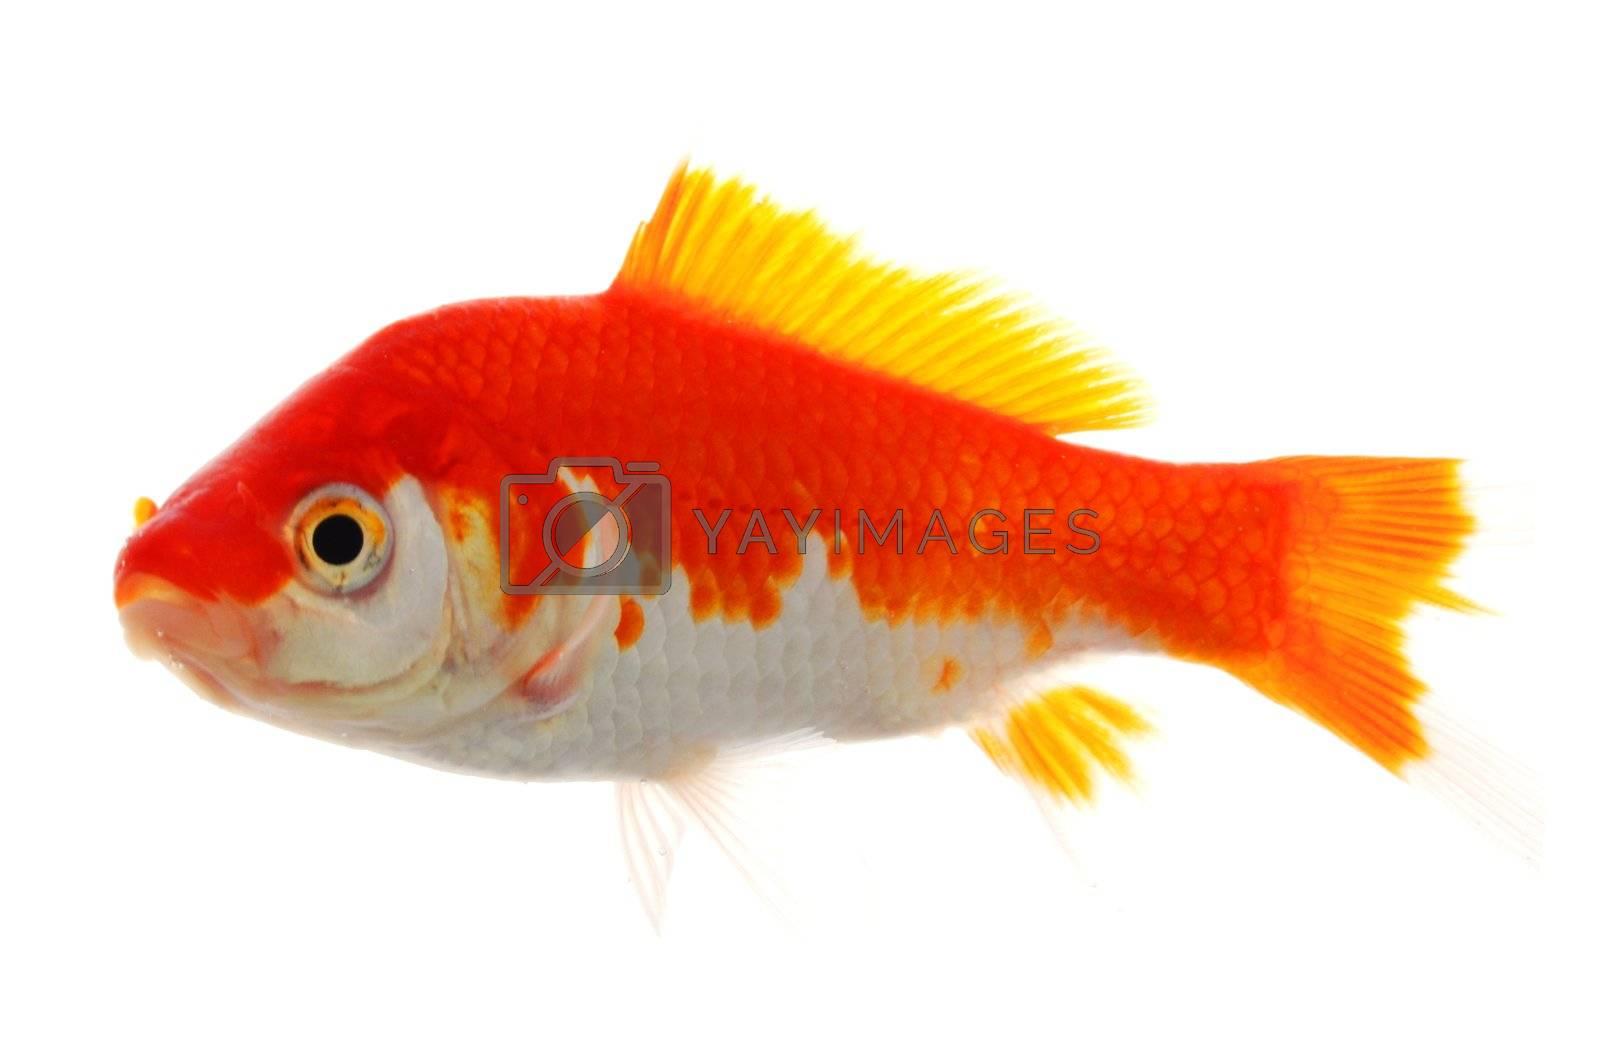 high quality image of goldfish swimming isolated on white background